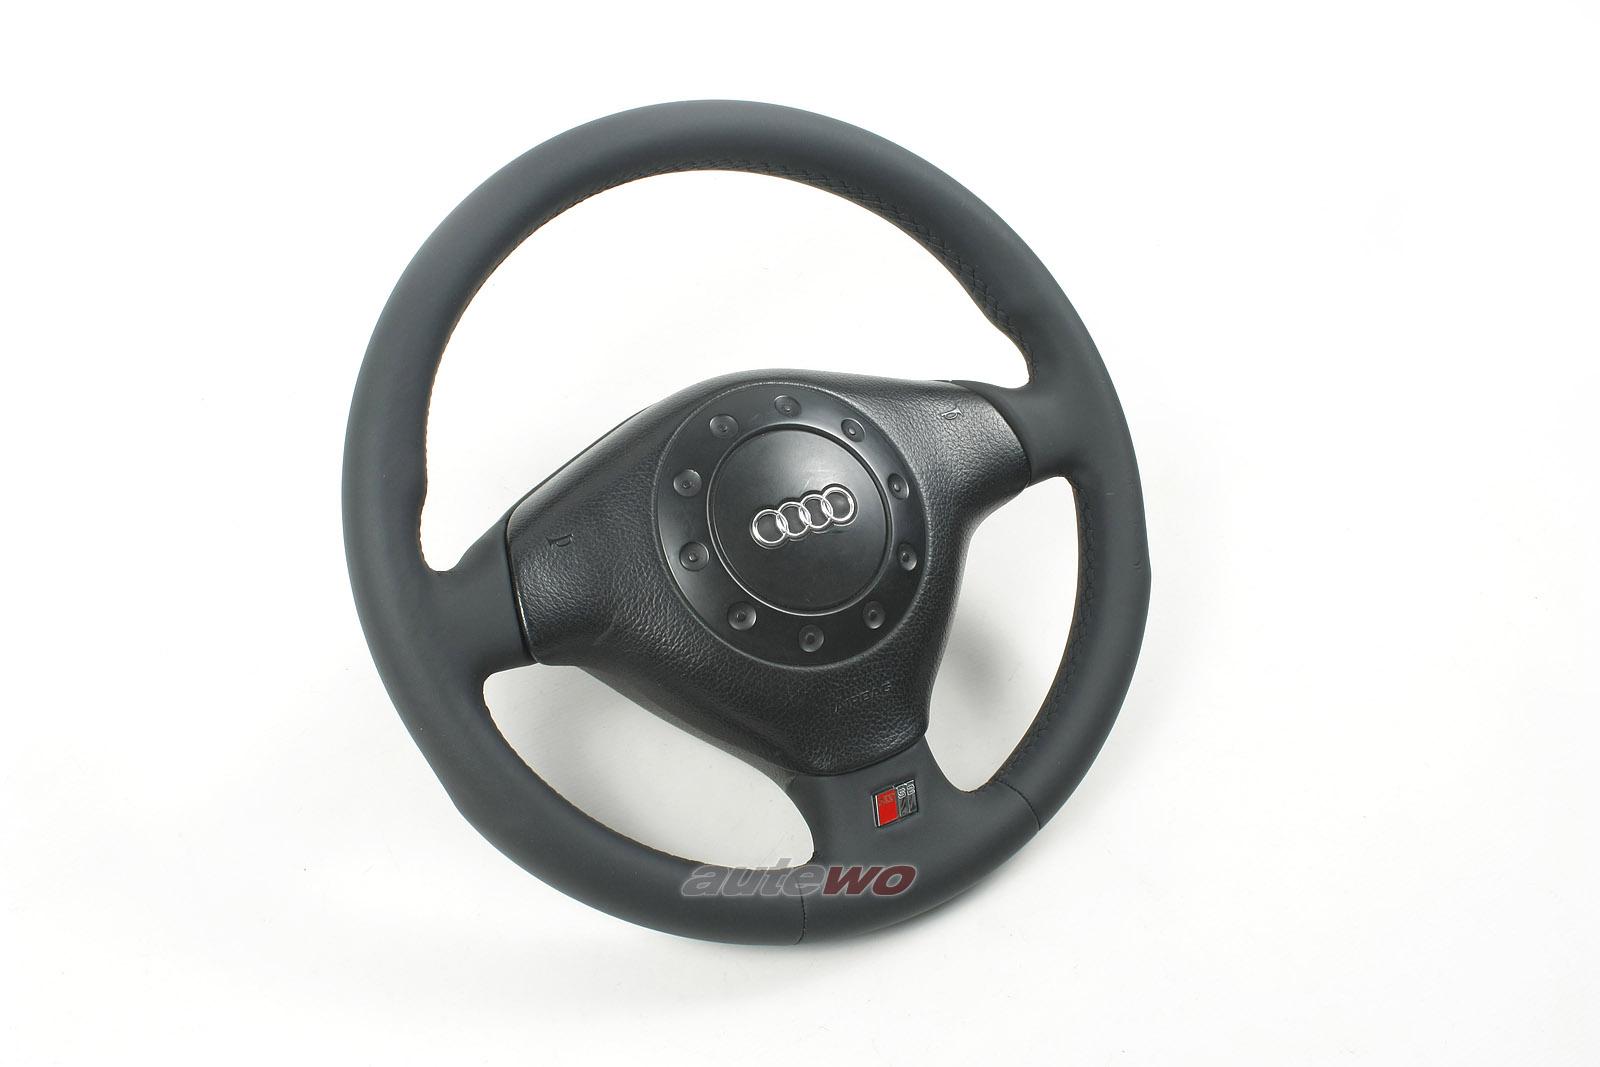 #4A0419091BA NEUBEZUG Audi 80 B4/S2 Coupe 89/Cabrio 3-Speichen-Leder-Lenkrad